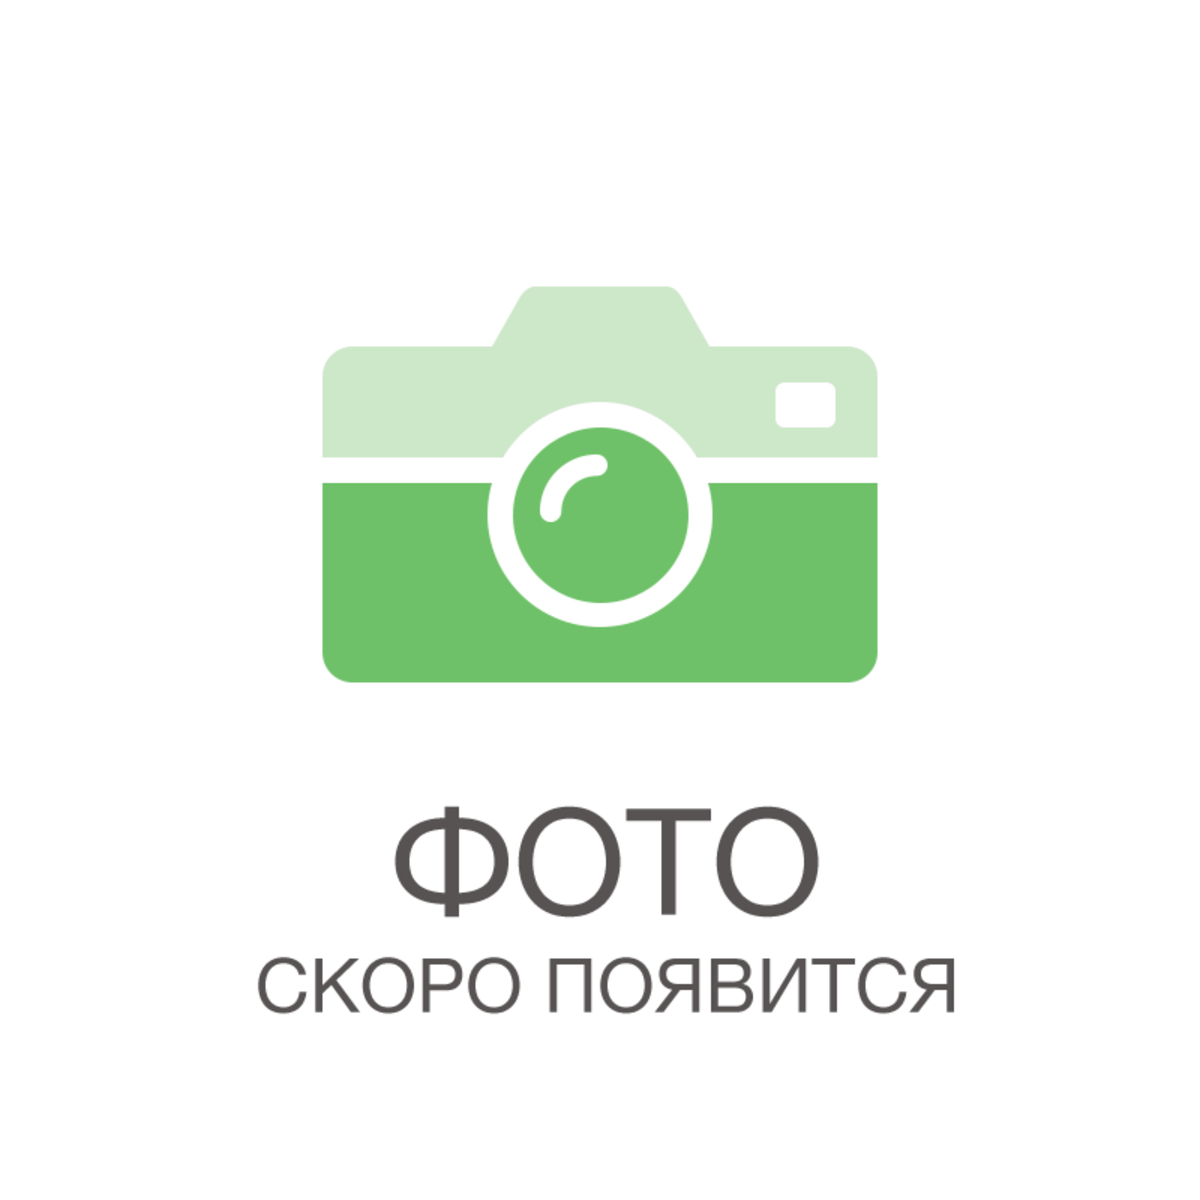 Дверь для шкафа Delinia ID «Реш» 30x102.4 см МДФ цвет белый